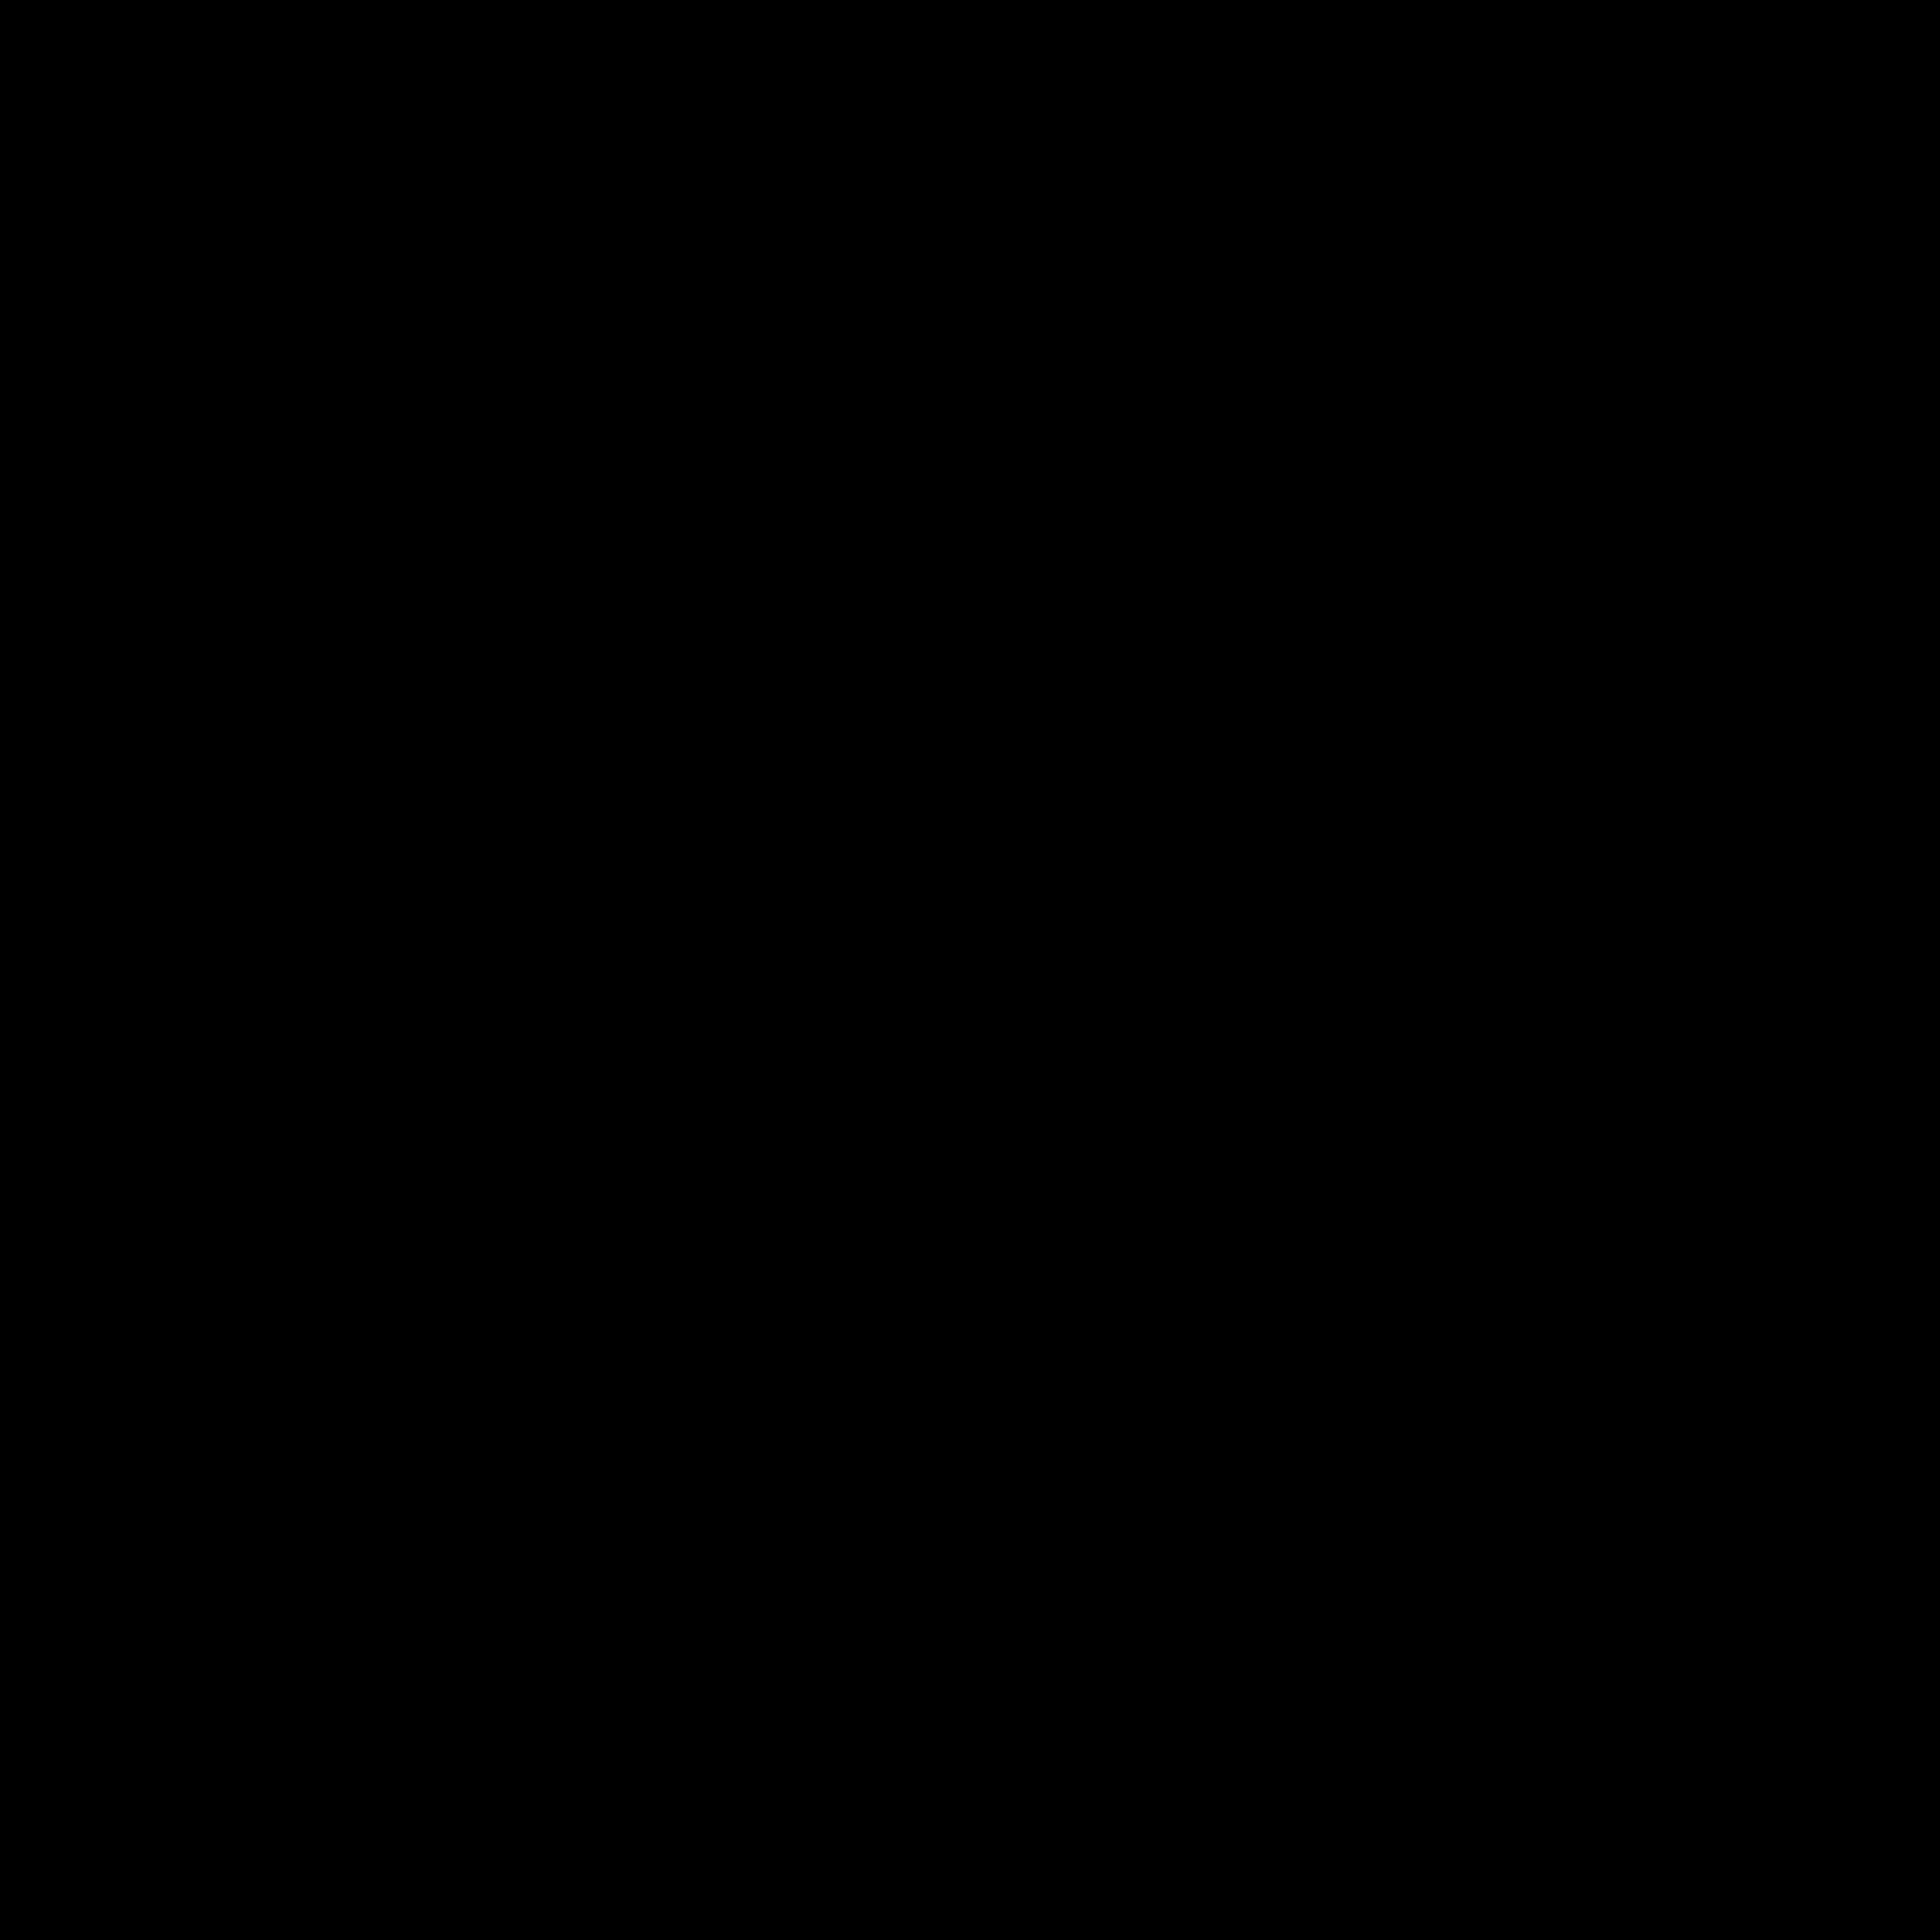 LEATHERMAN - Tread Bracelet, The Original Travel Friendly Wearable Multitool, Black by LEATHERMAN (Image #2)